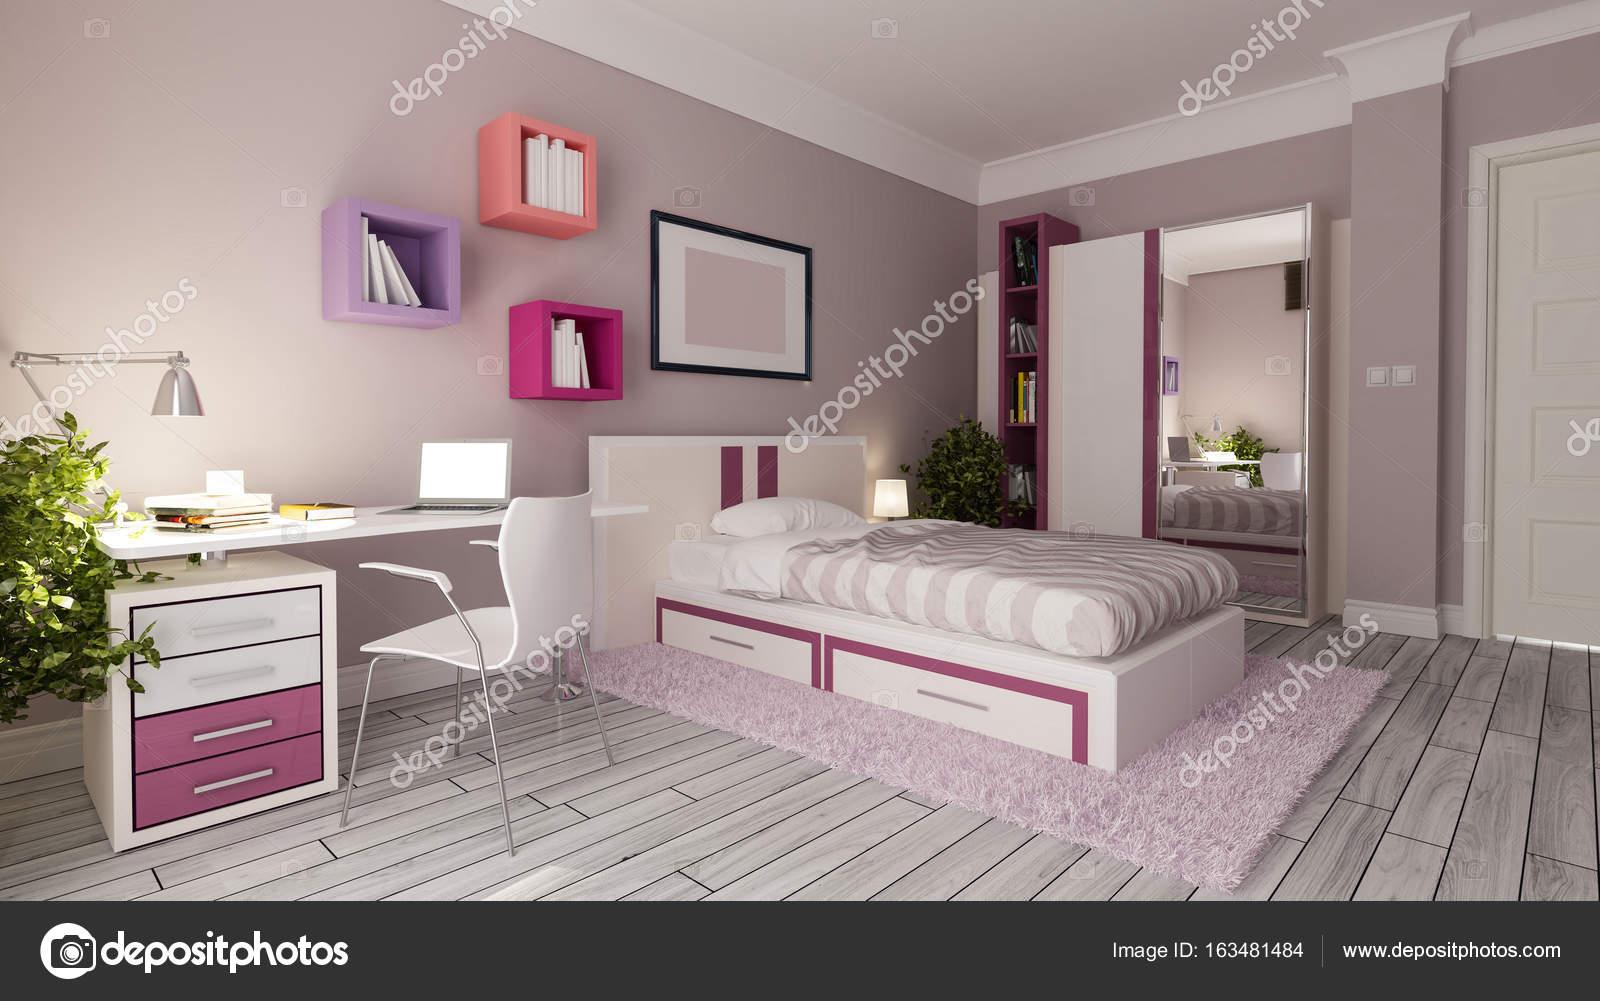 Tiener meisje slaapkamer design idee u stockfoto sseven